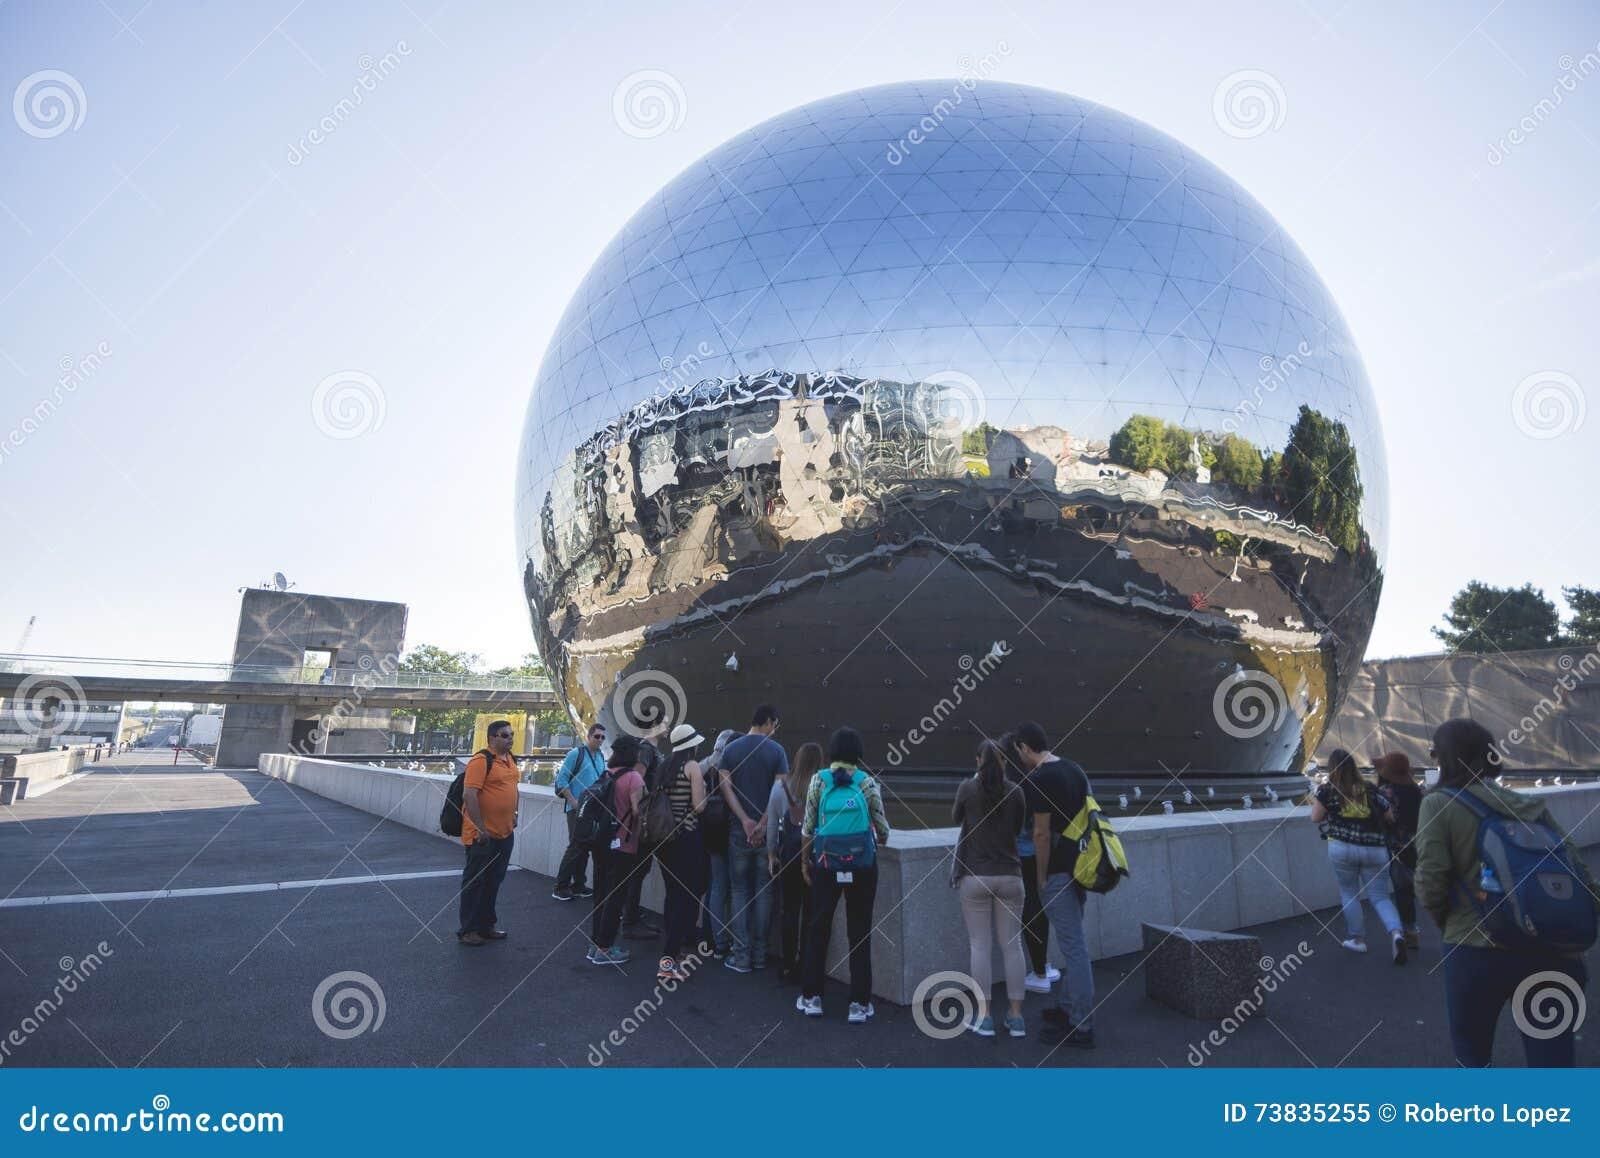 Szklana sfera na parku